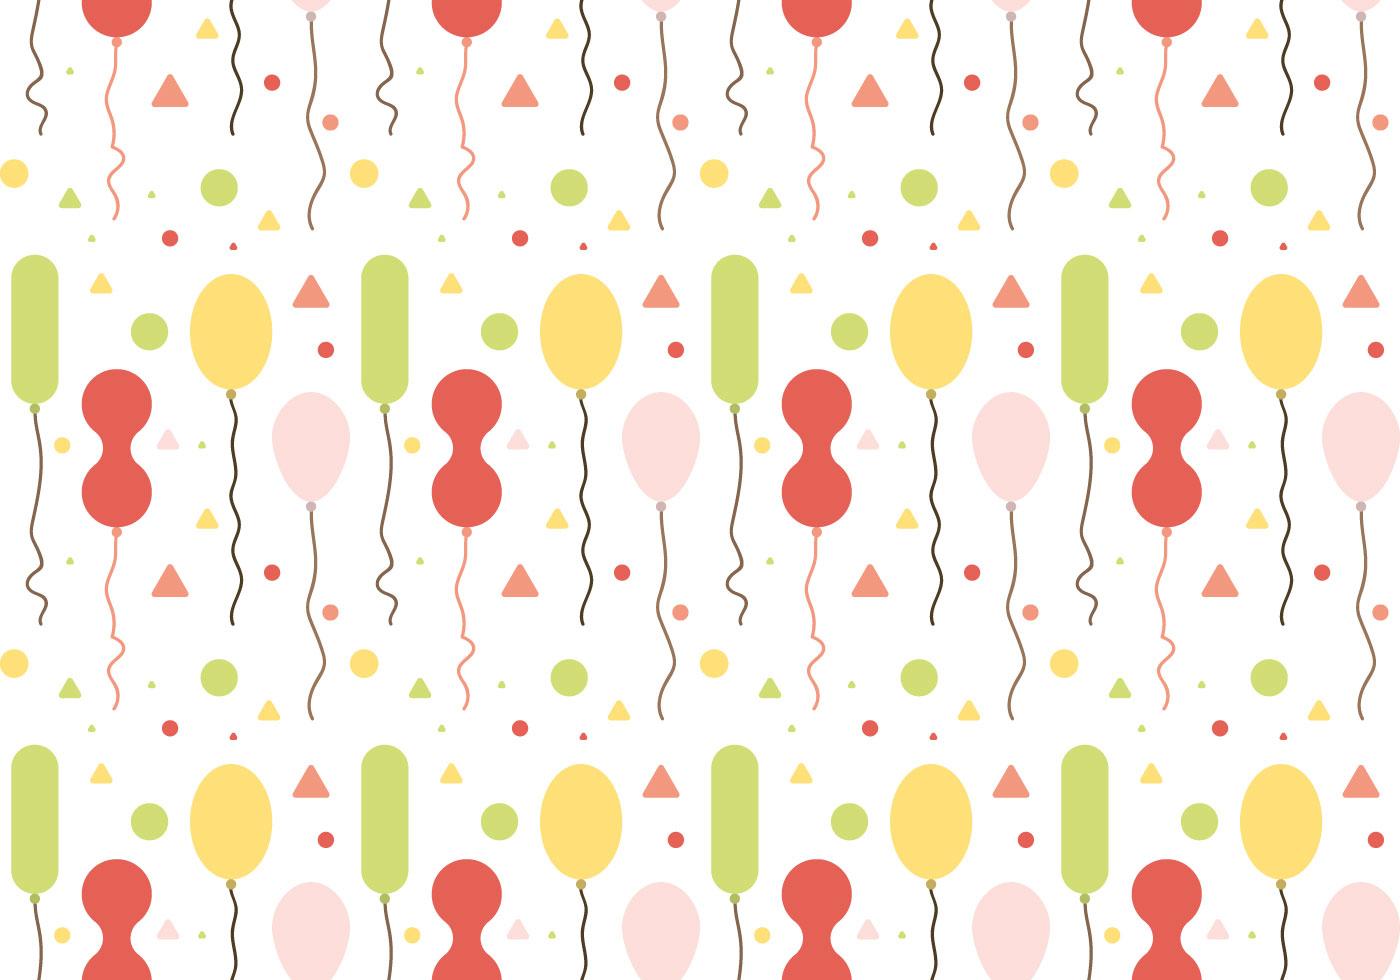 Free Balloons Pattern Vector #1